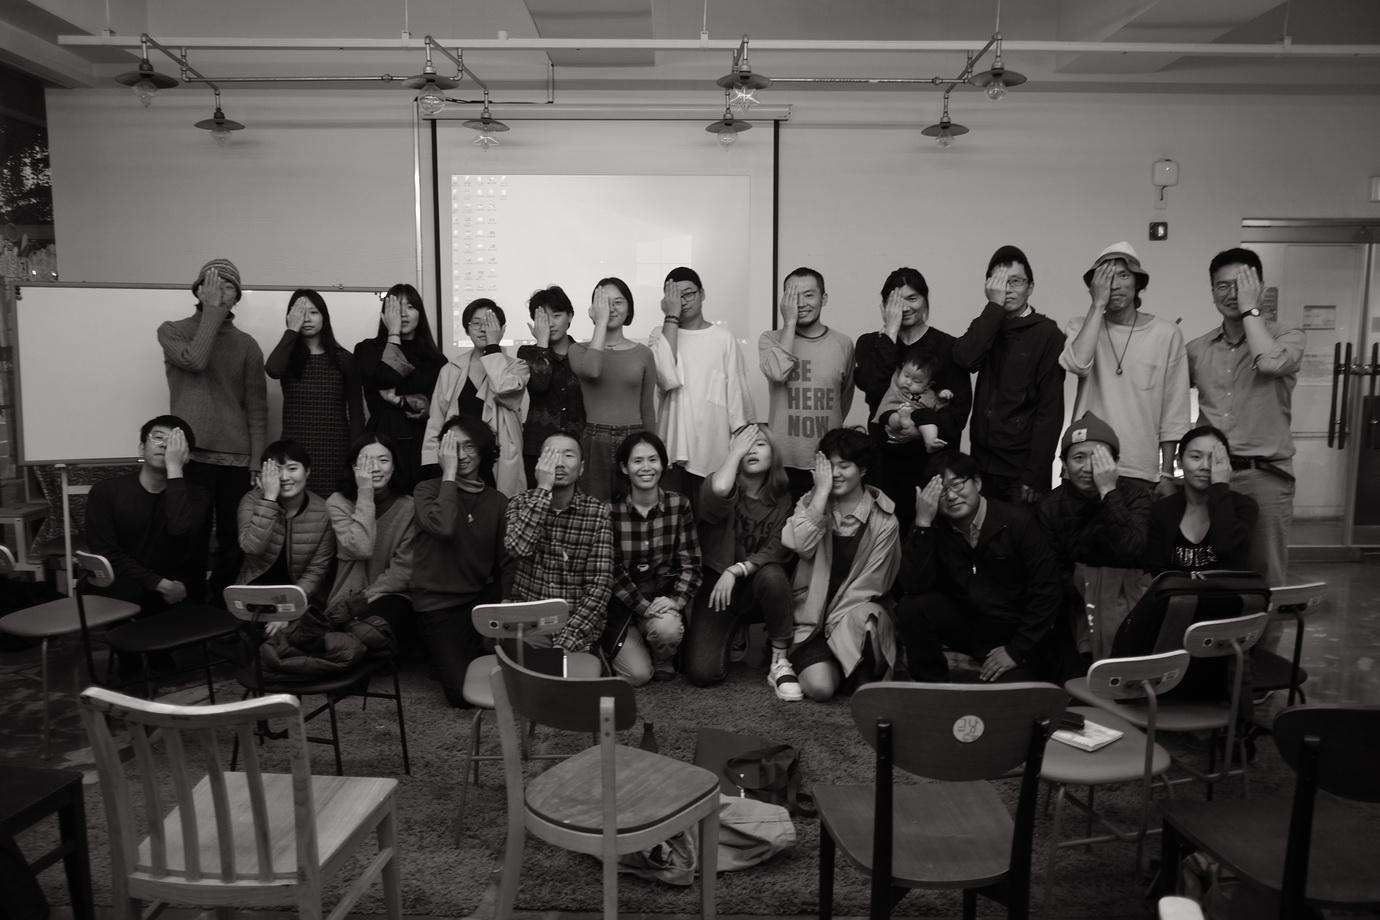 2019-11-01 17-10-fujiimon 이병한 조성환 개벽학당 레이와유신_09_resize